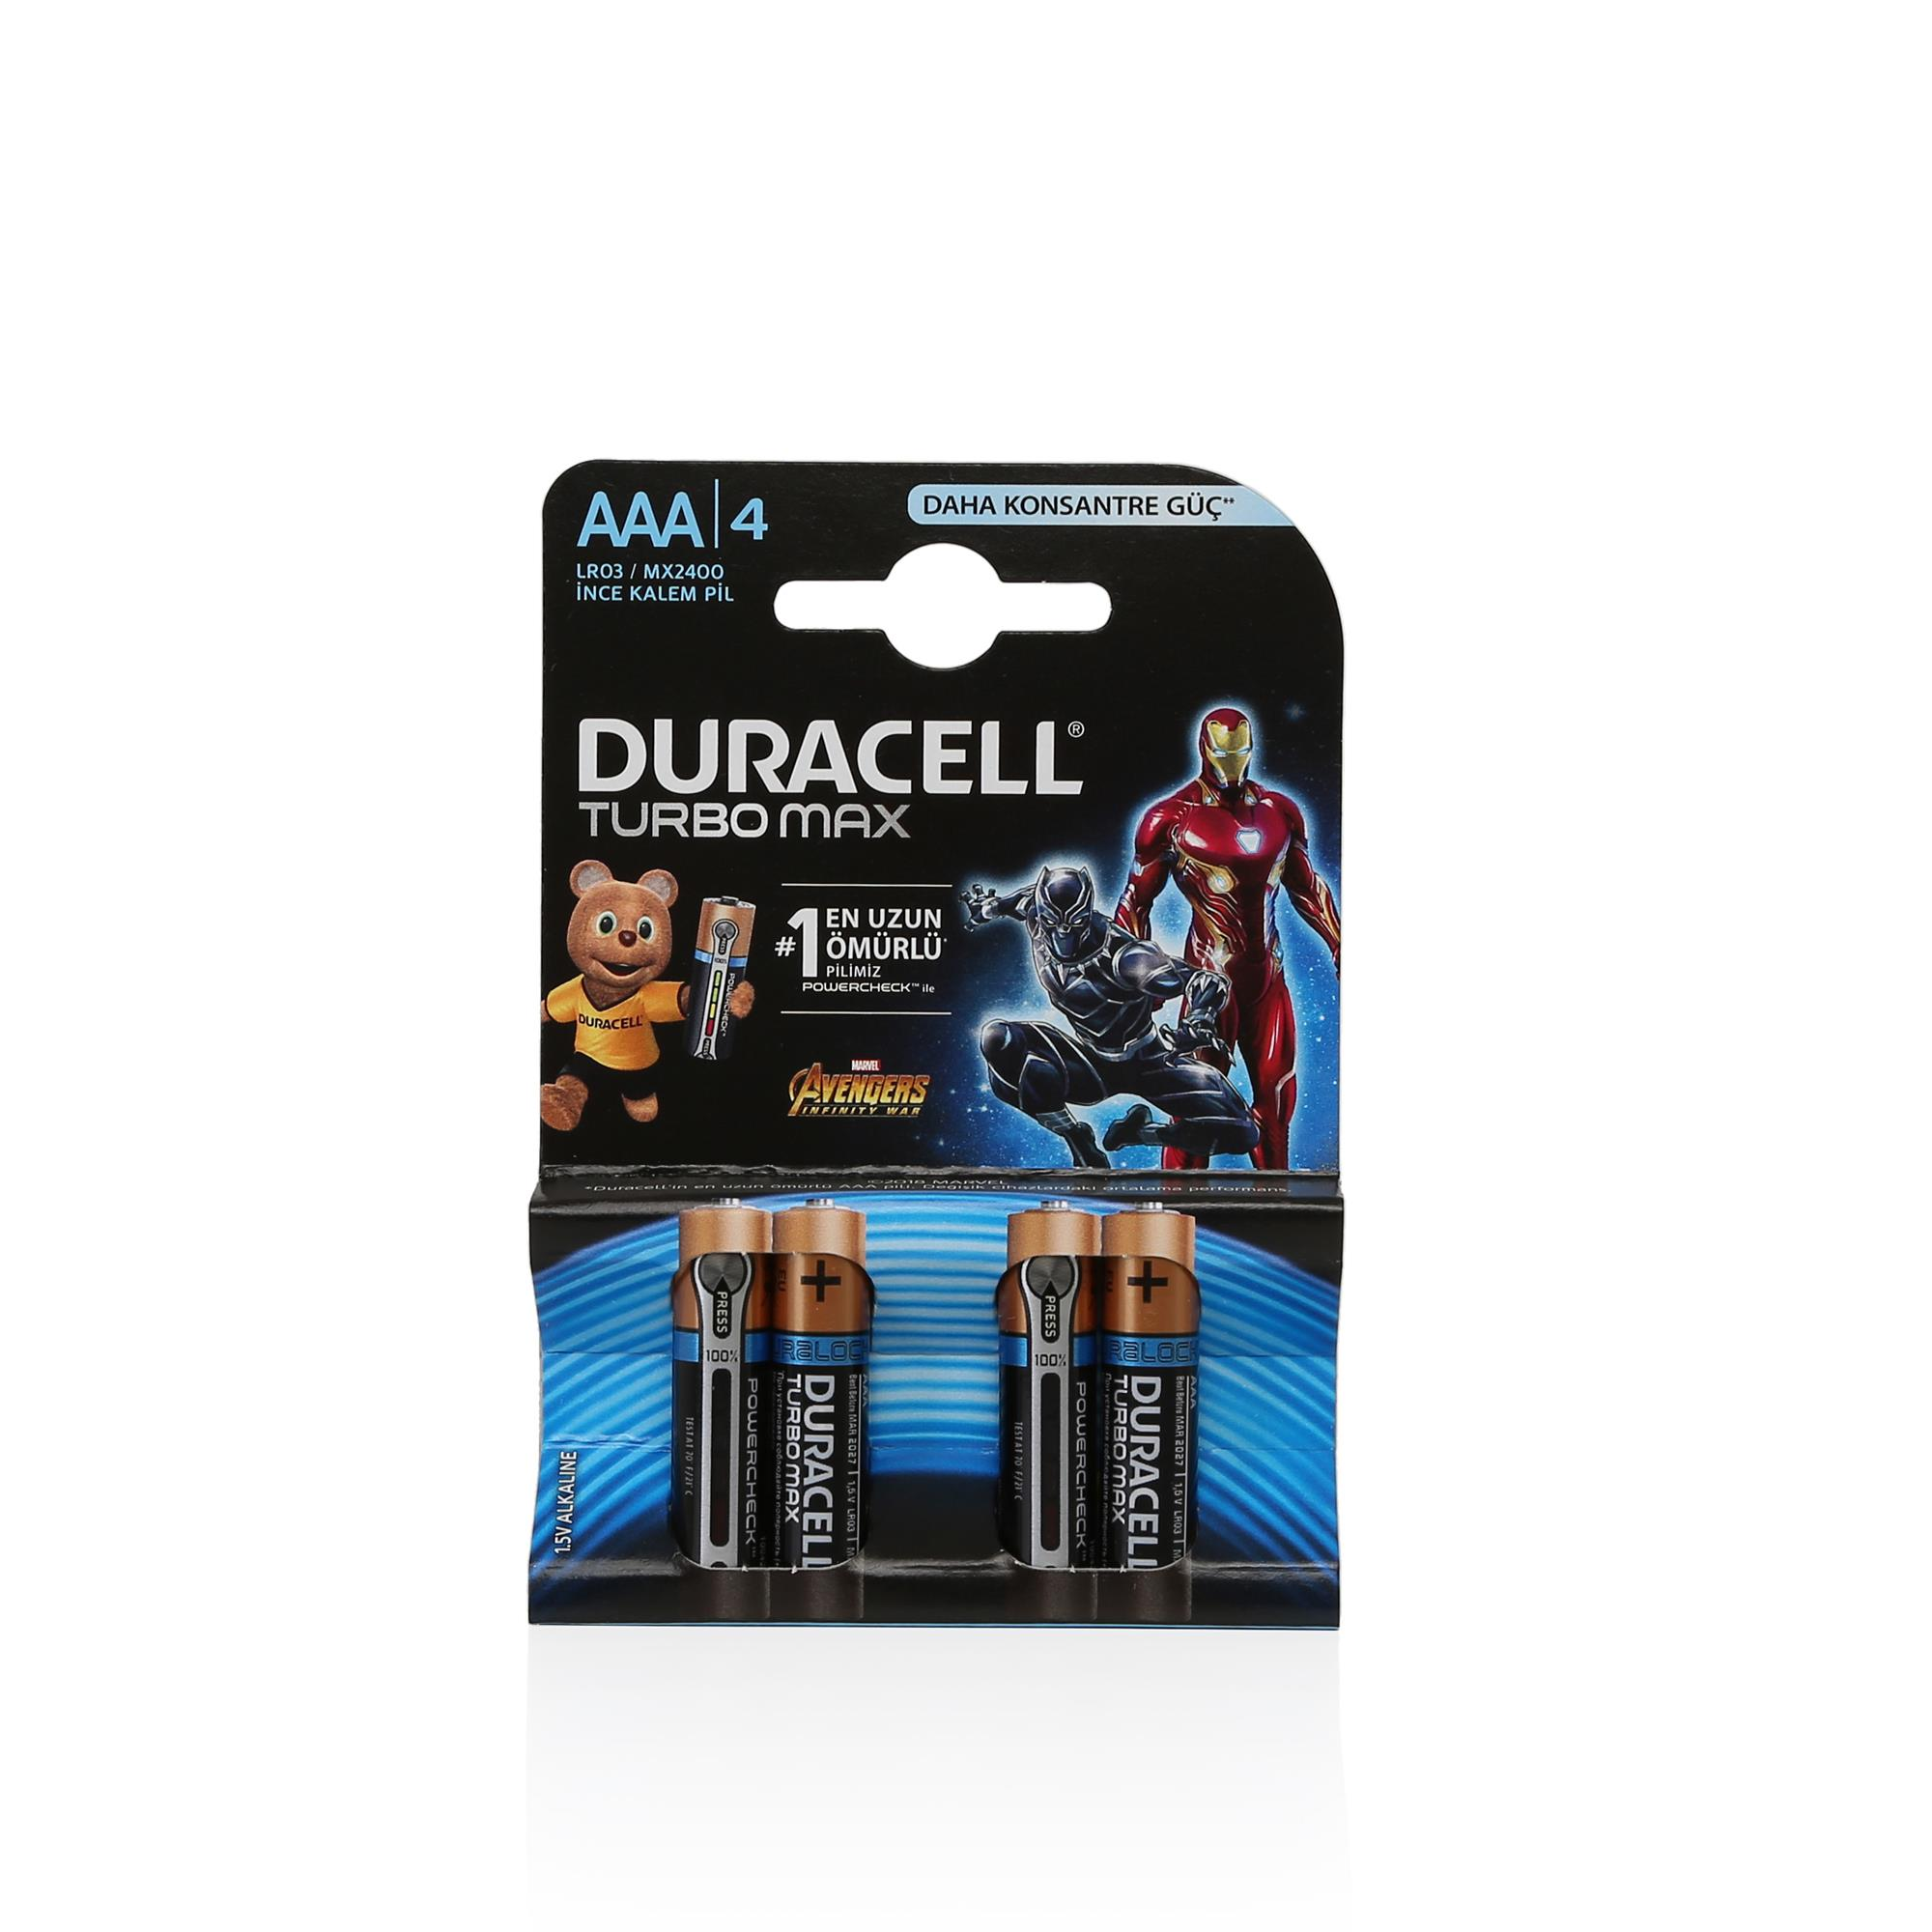 DURACELL TURBO MAX AAA İNCE PİL 4LÜ